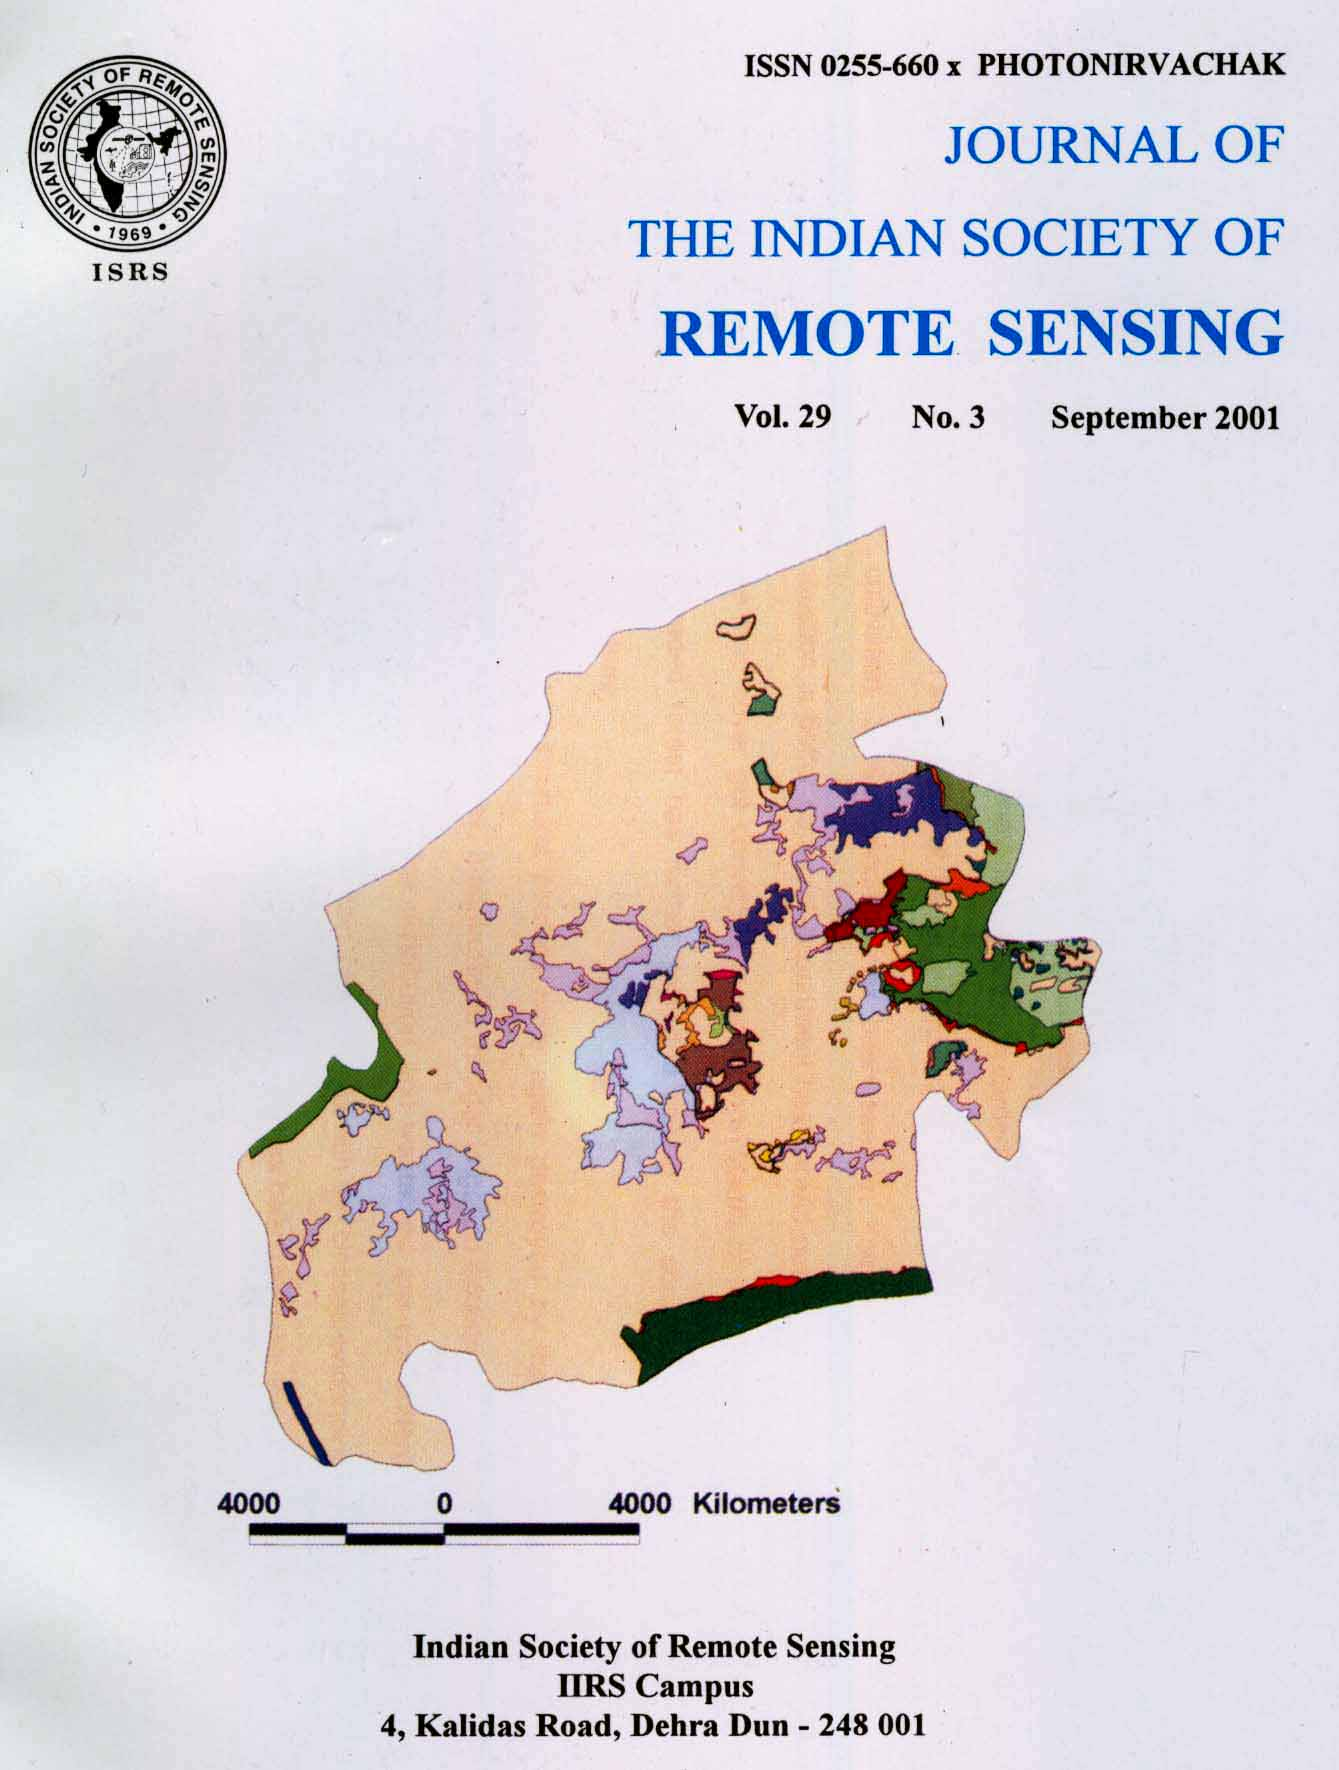 `Remote sensing data benefits Indian farmers, fishermen`